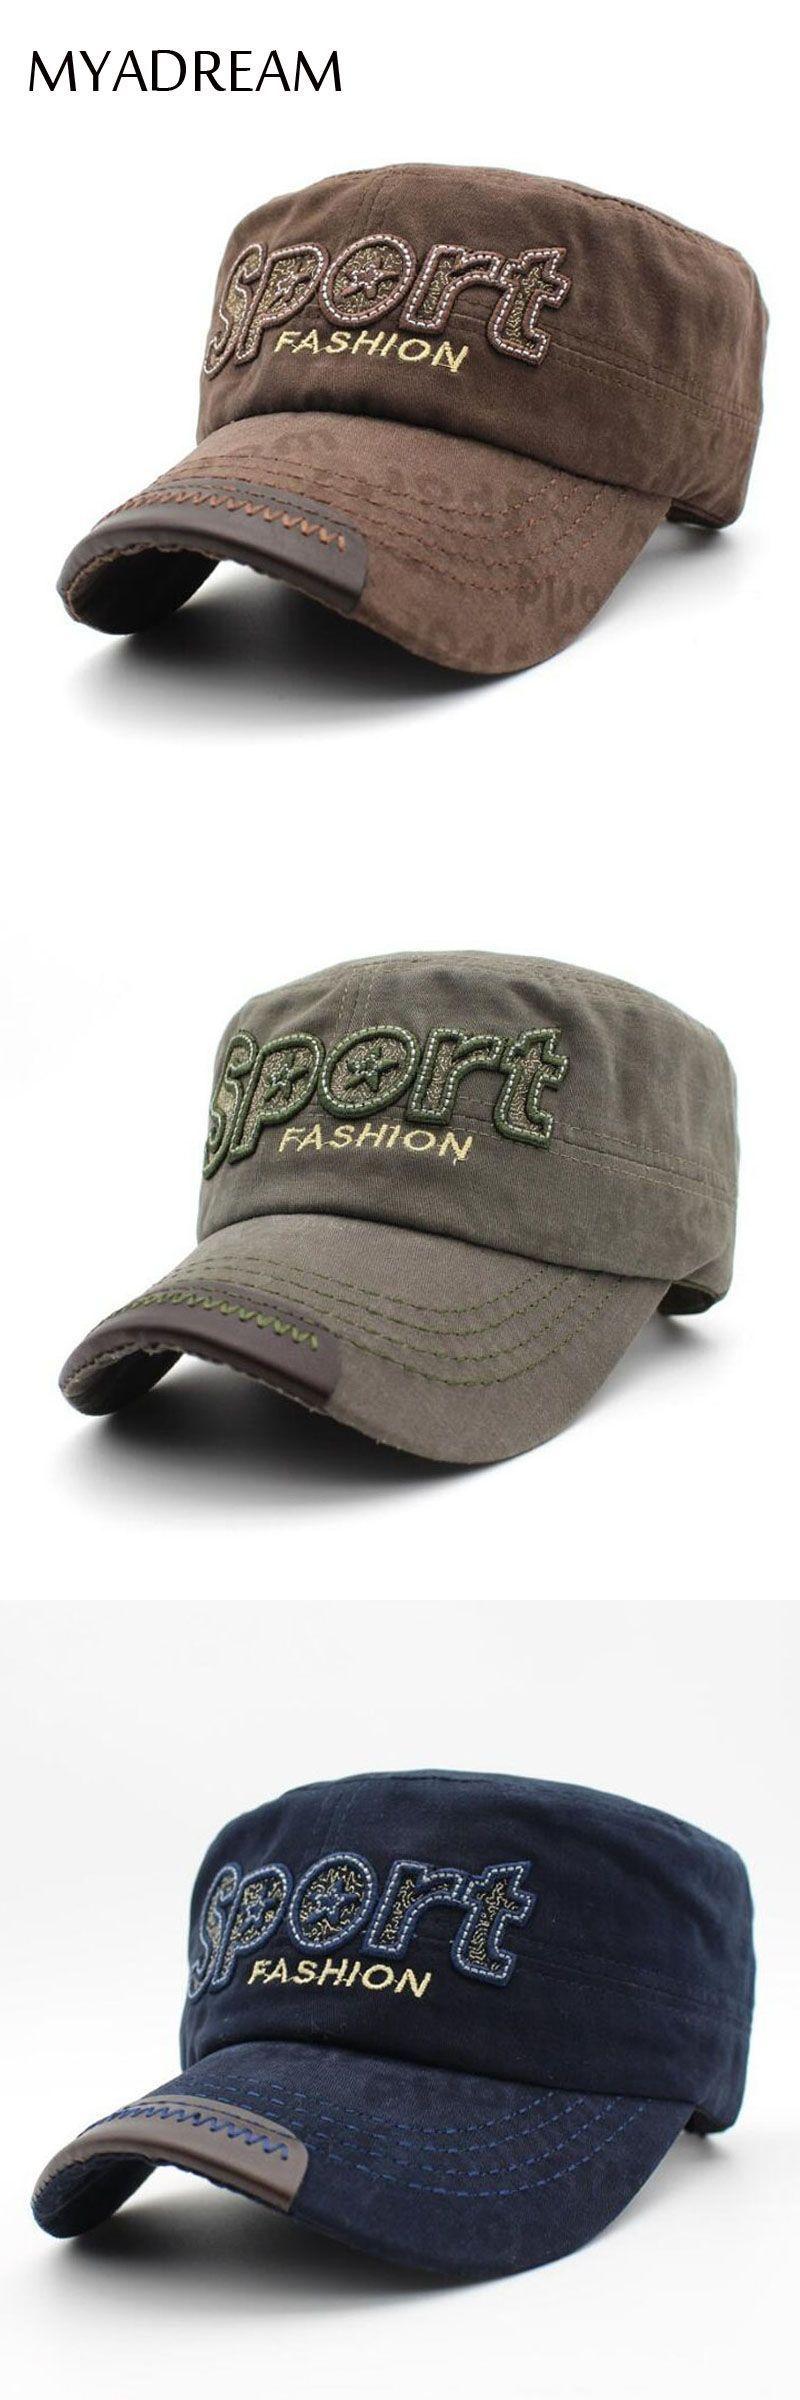 ff8dea220a5d8 MYADREAM SPORT Cotton Military Cap Unisex Military Hat for Women Men Flat  Top Black Army Green